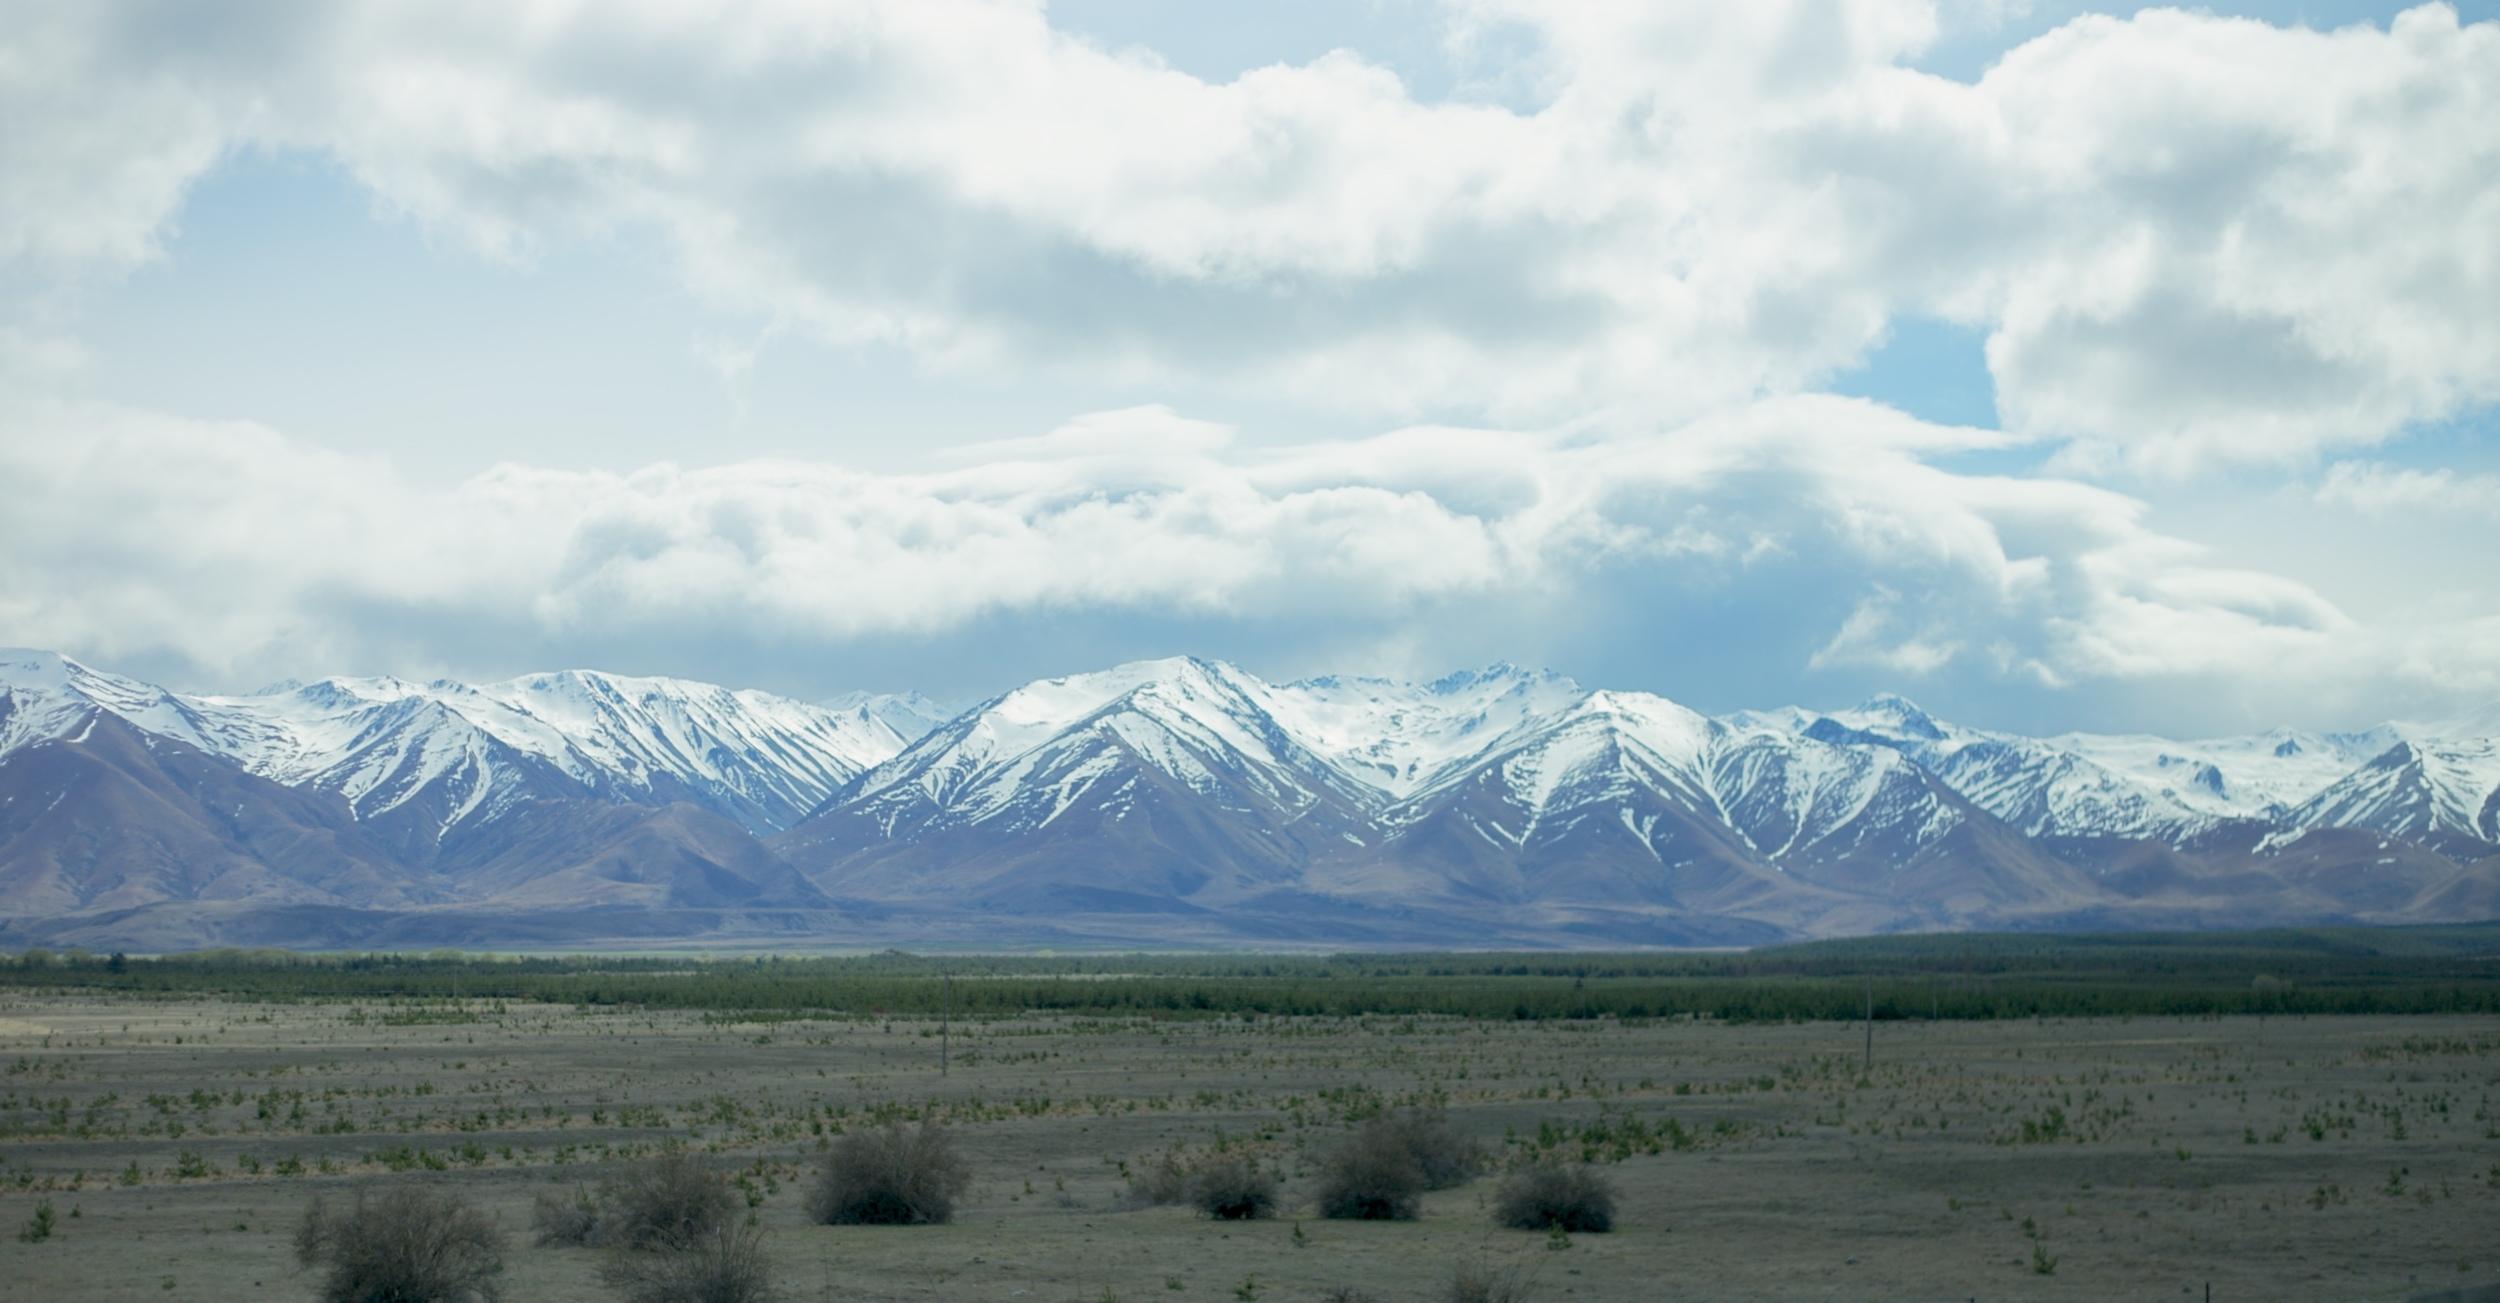 New Zealand mountains and plains, near Aoraki.